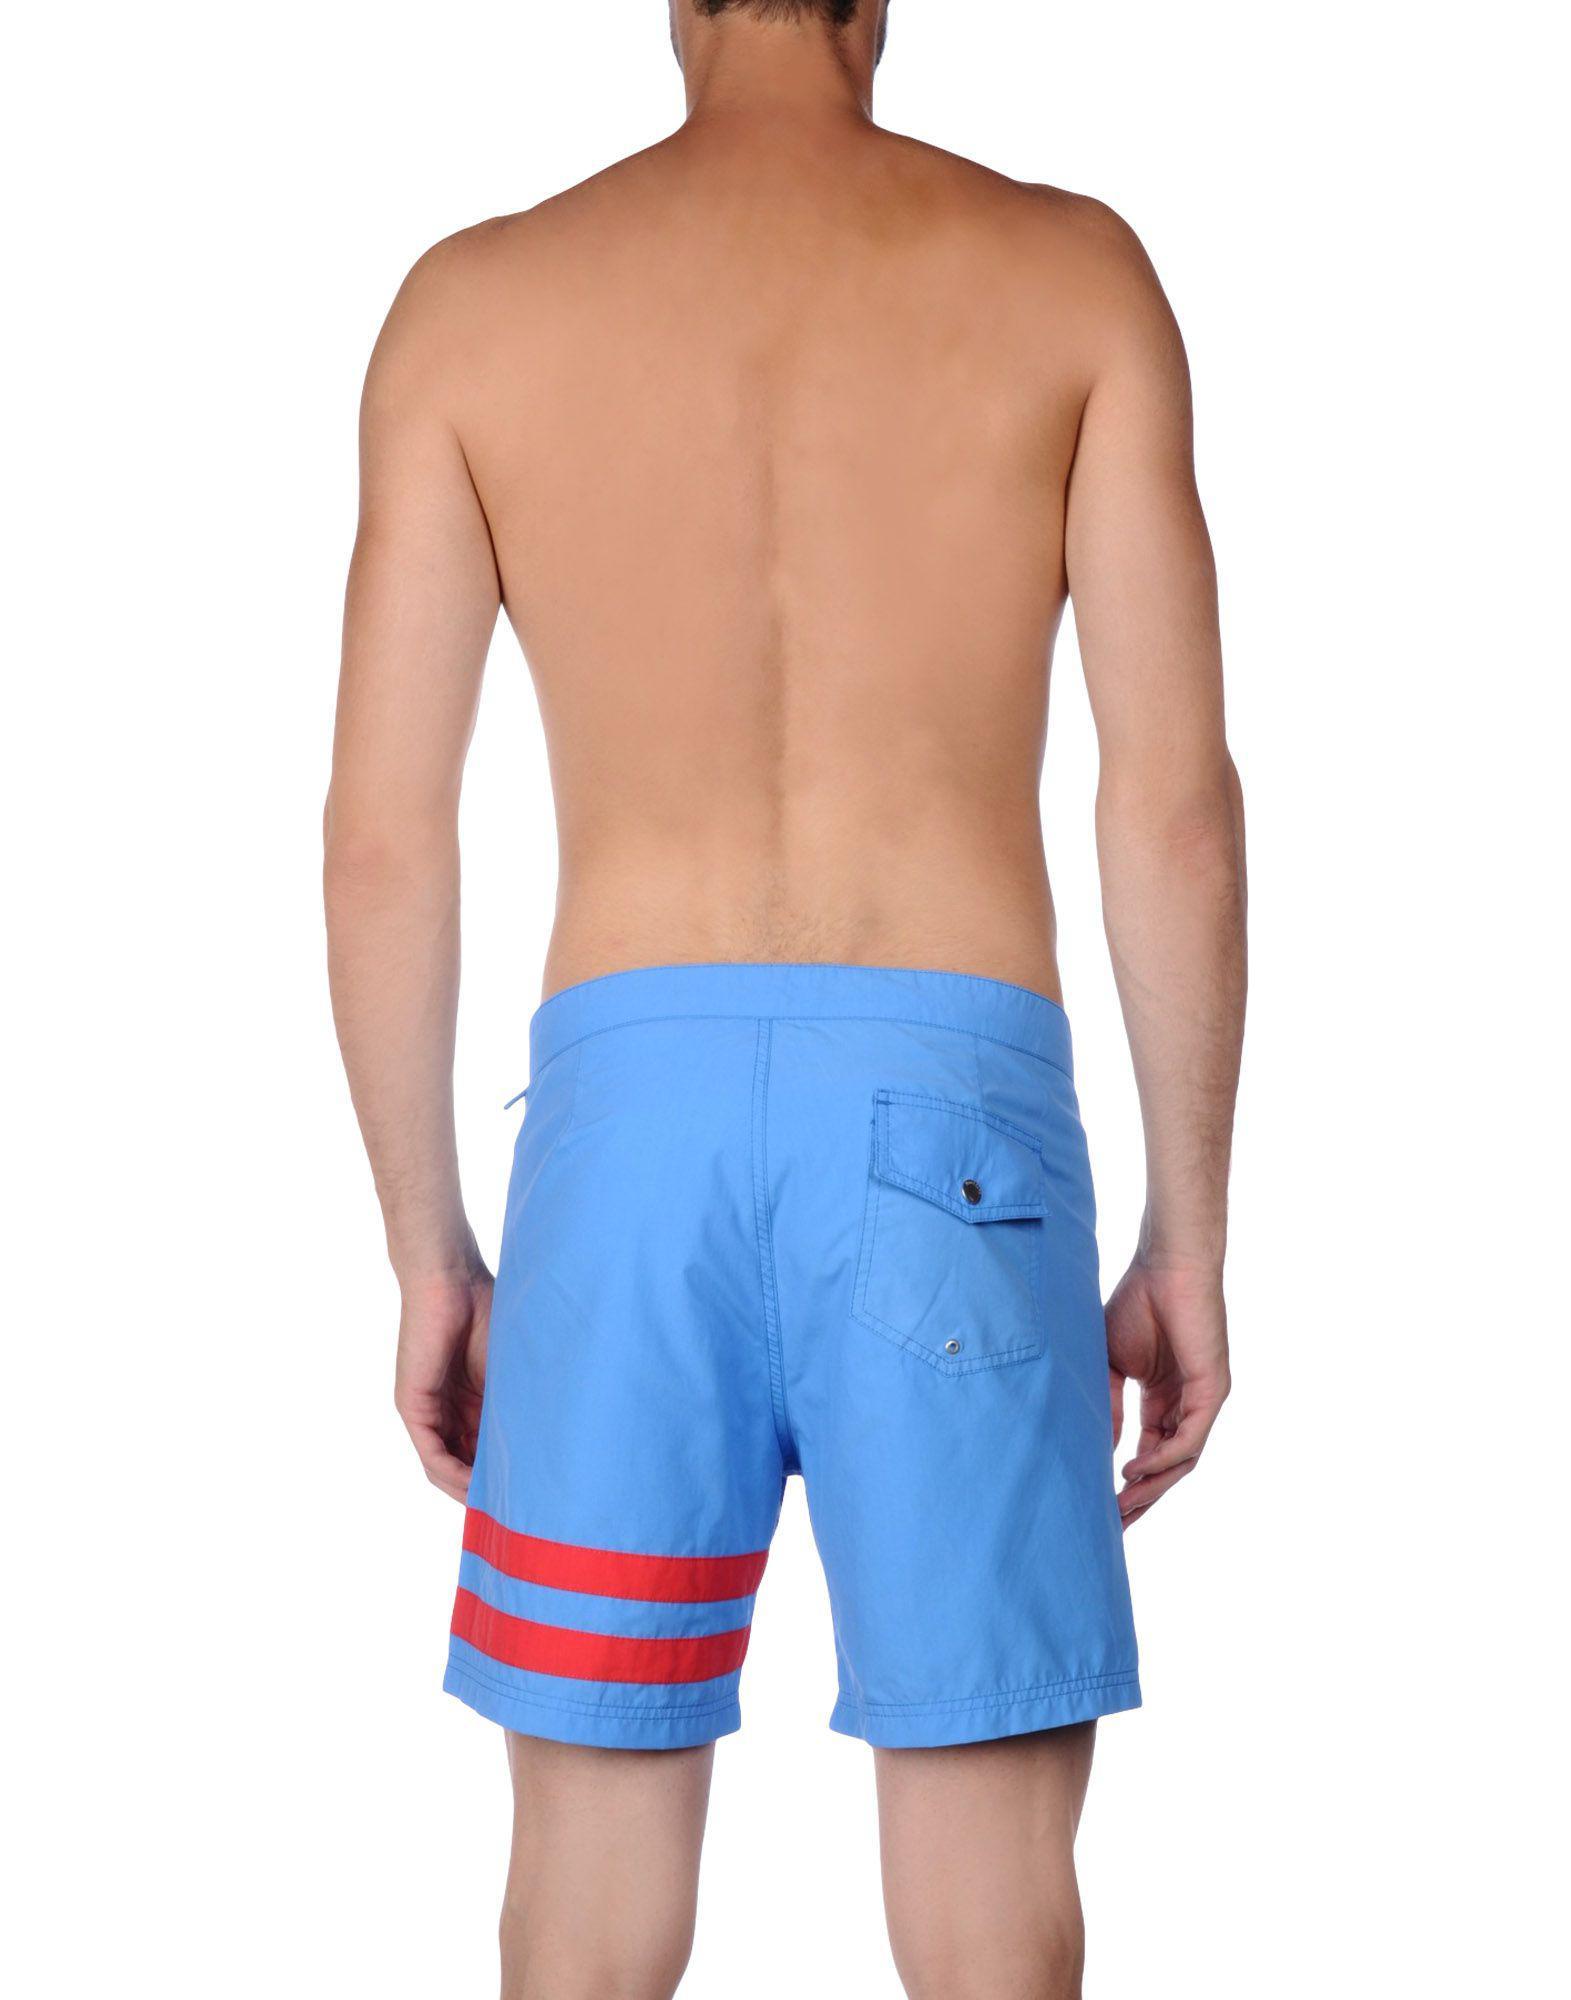 d85f278ac6 Hartford Swimming Trunks in Blue for Men - Lyst